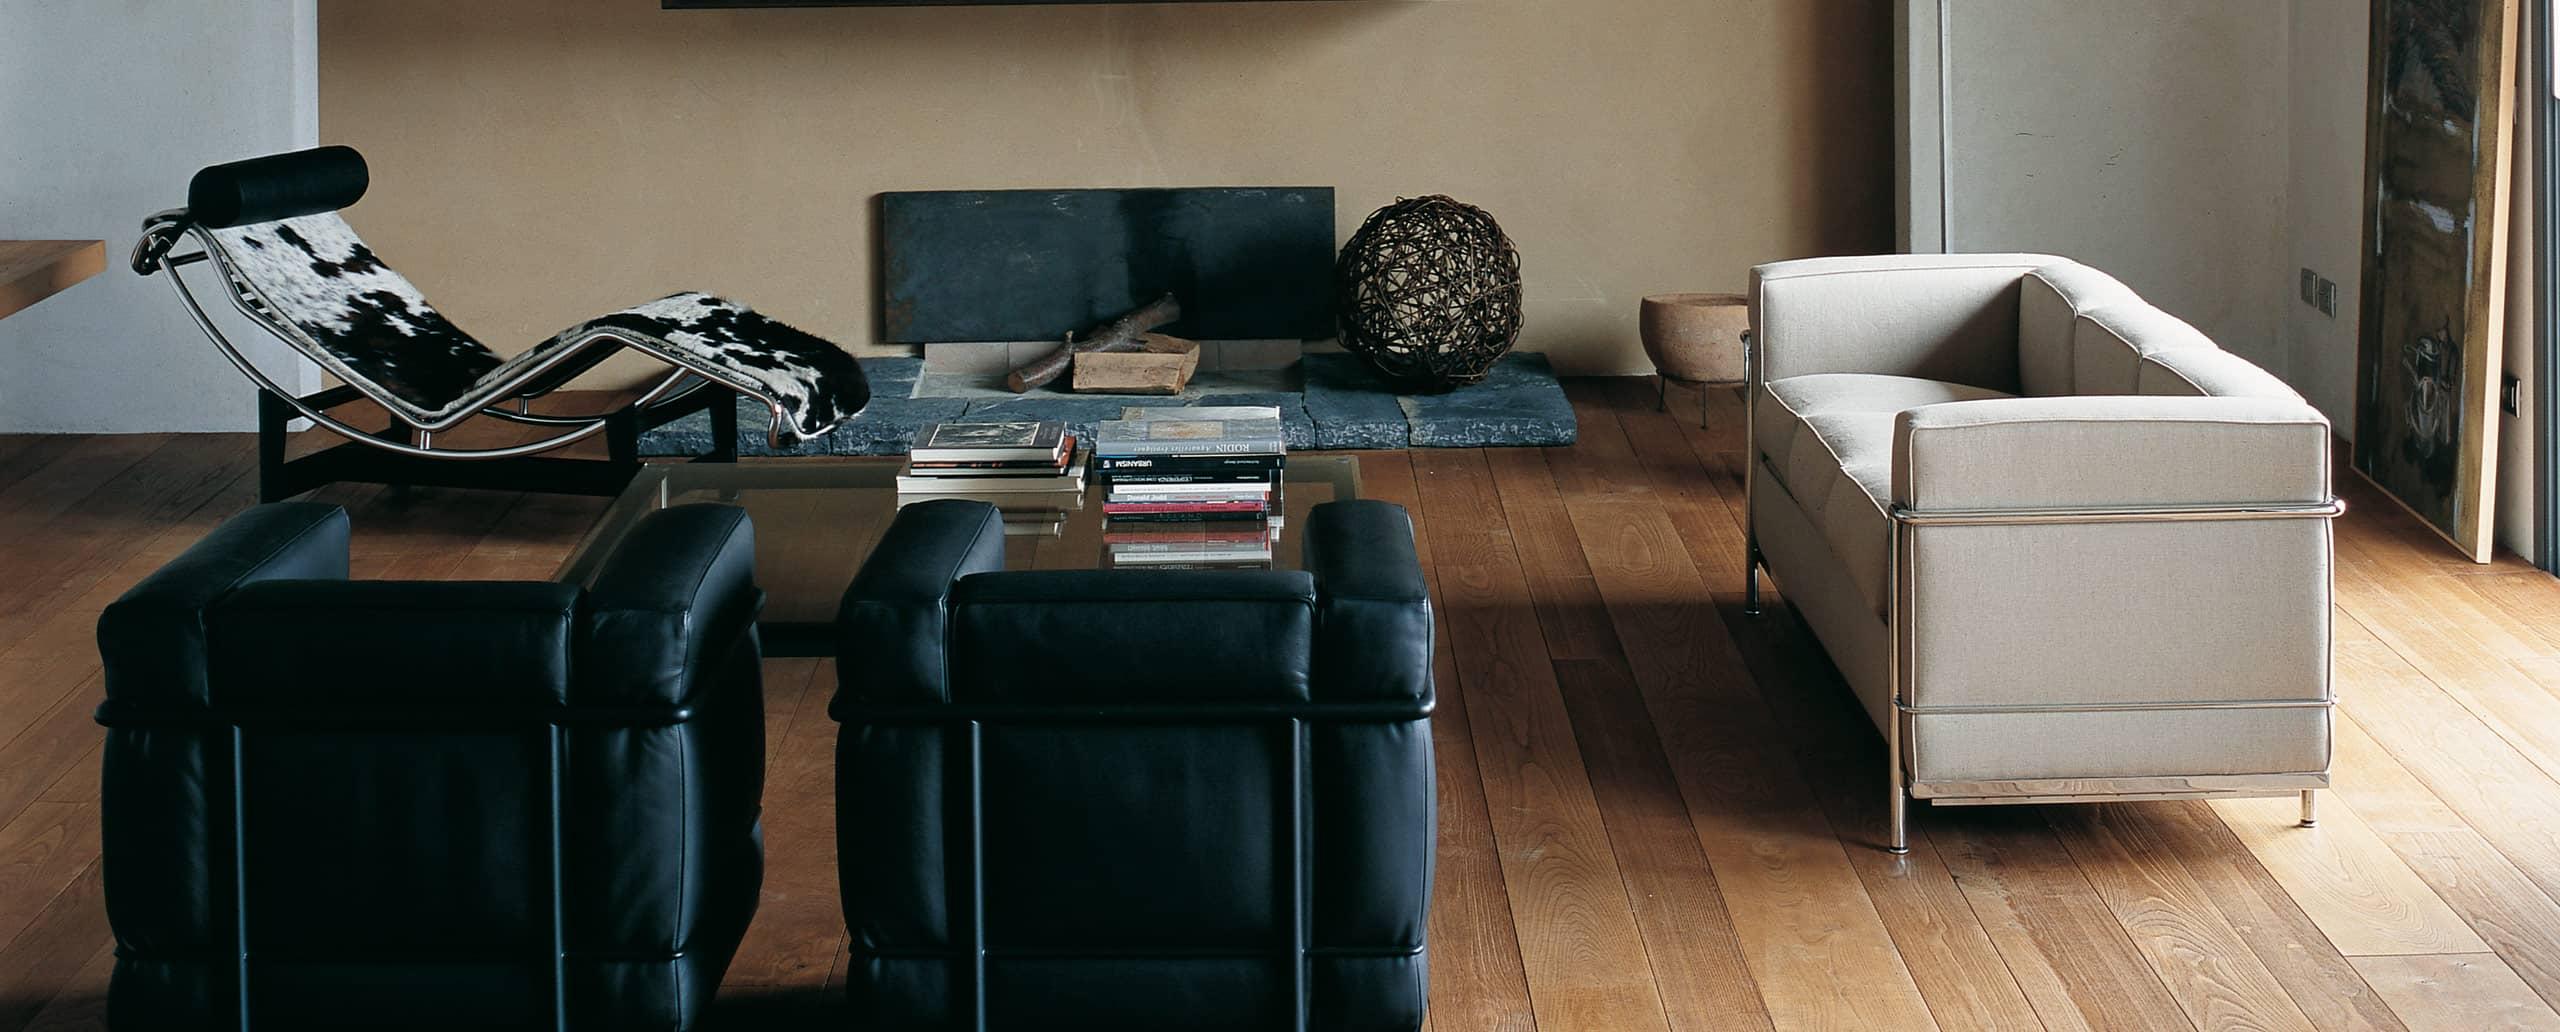 Sitzgruppe mit dem Cassina Sessel LC2 in schwarzem Leder, Sofa LC2 in beigem Stoff und dem LC4 Chaiselongue in Kuhfell